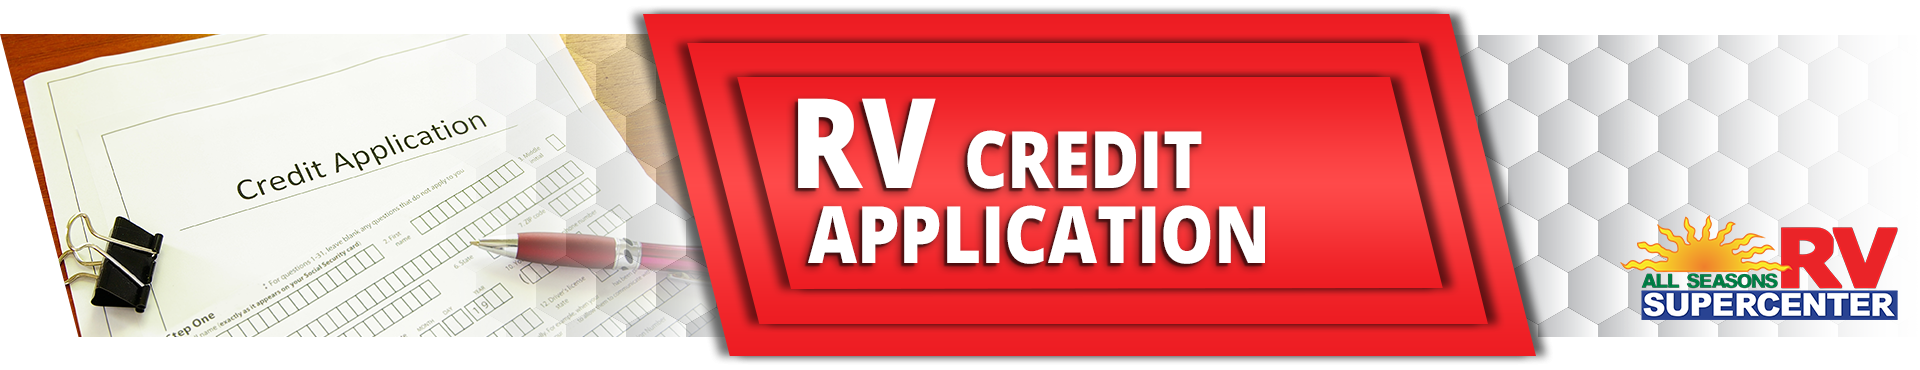 RV Credit Application on All Seasons RV